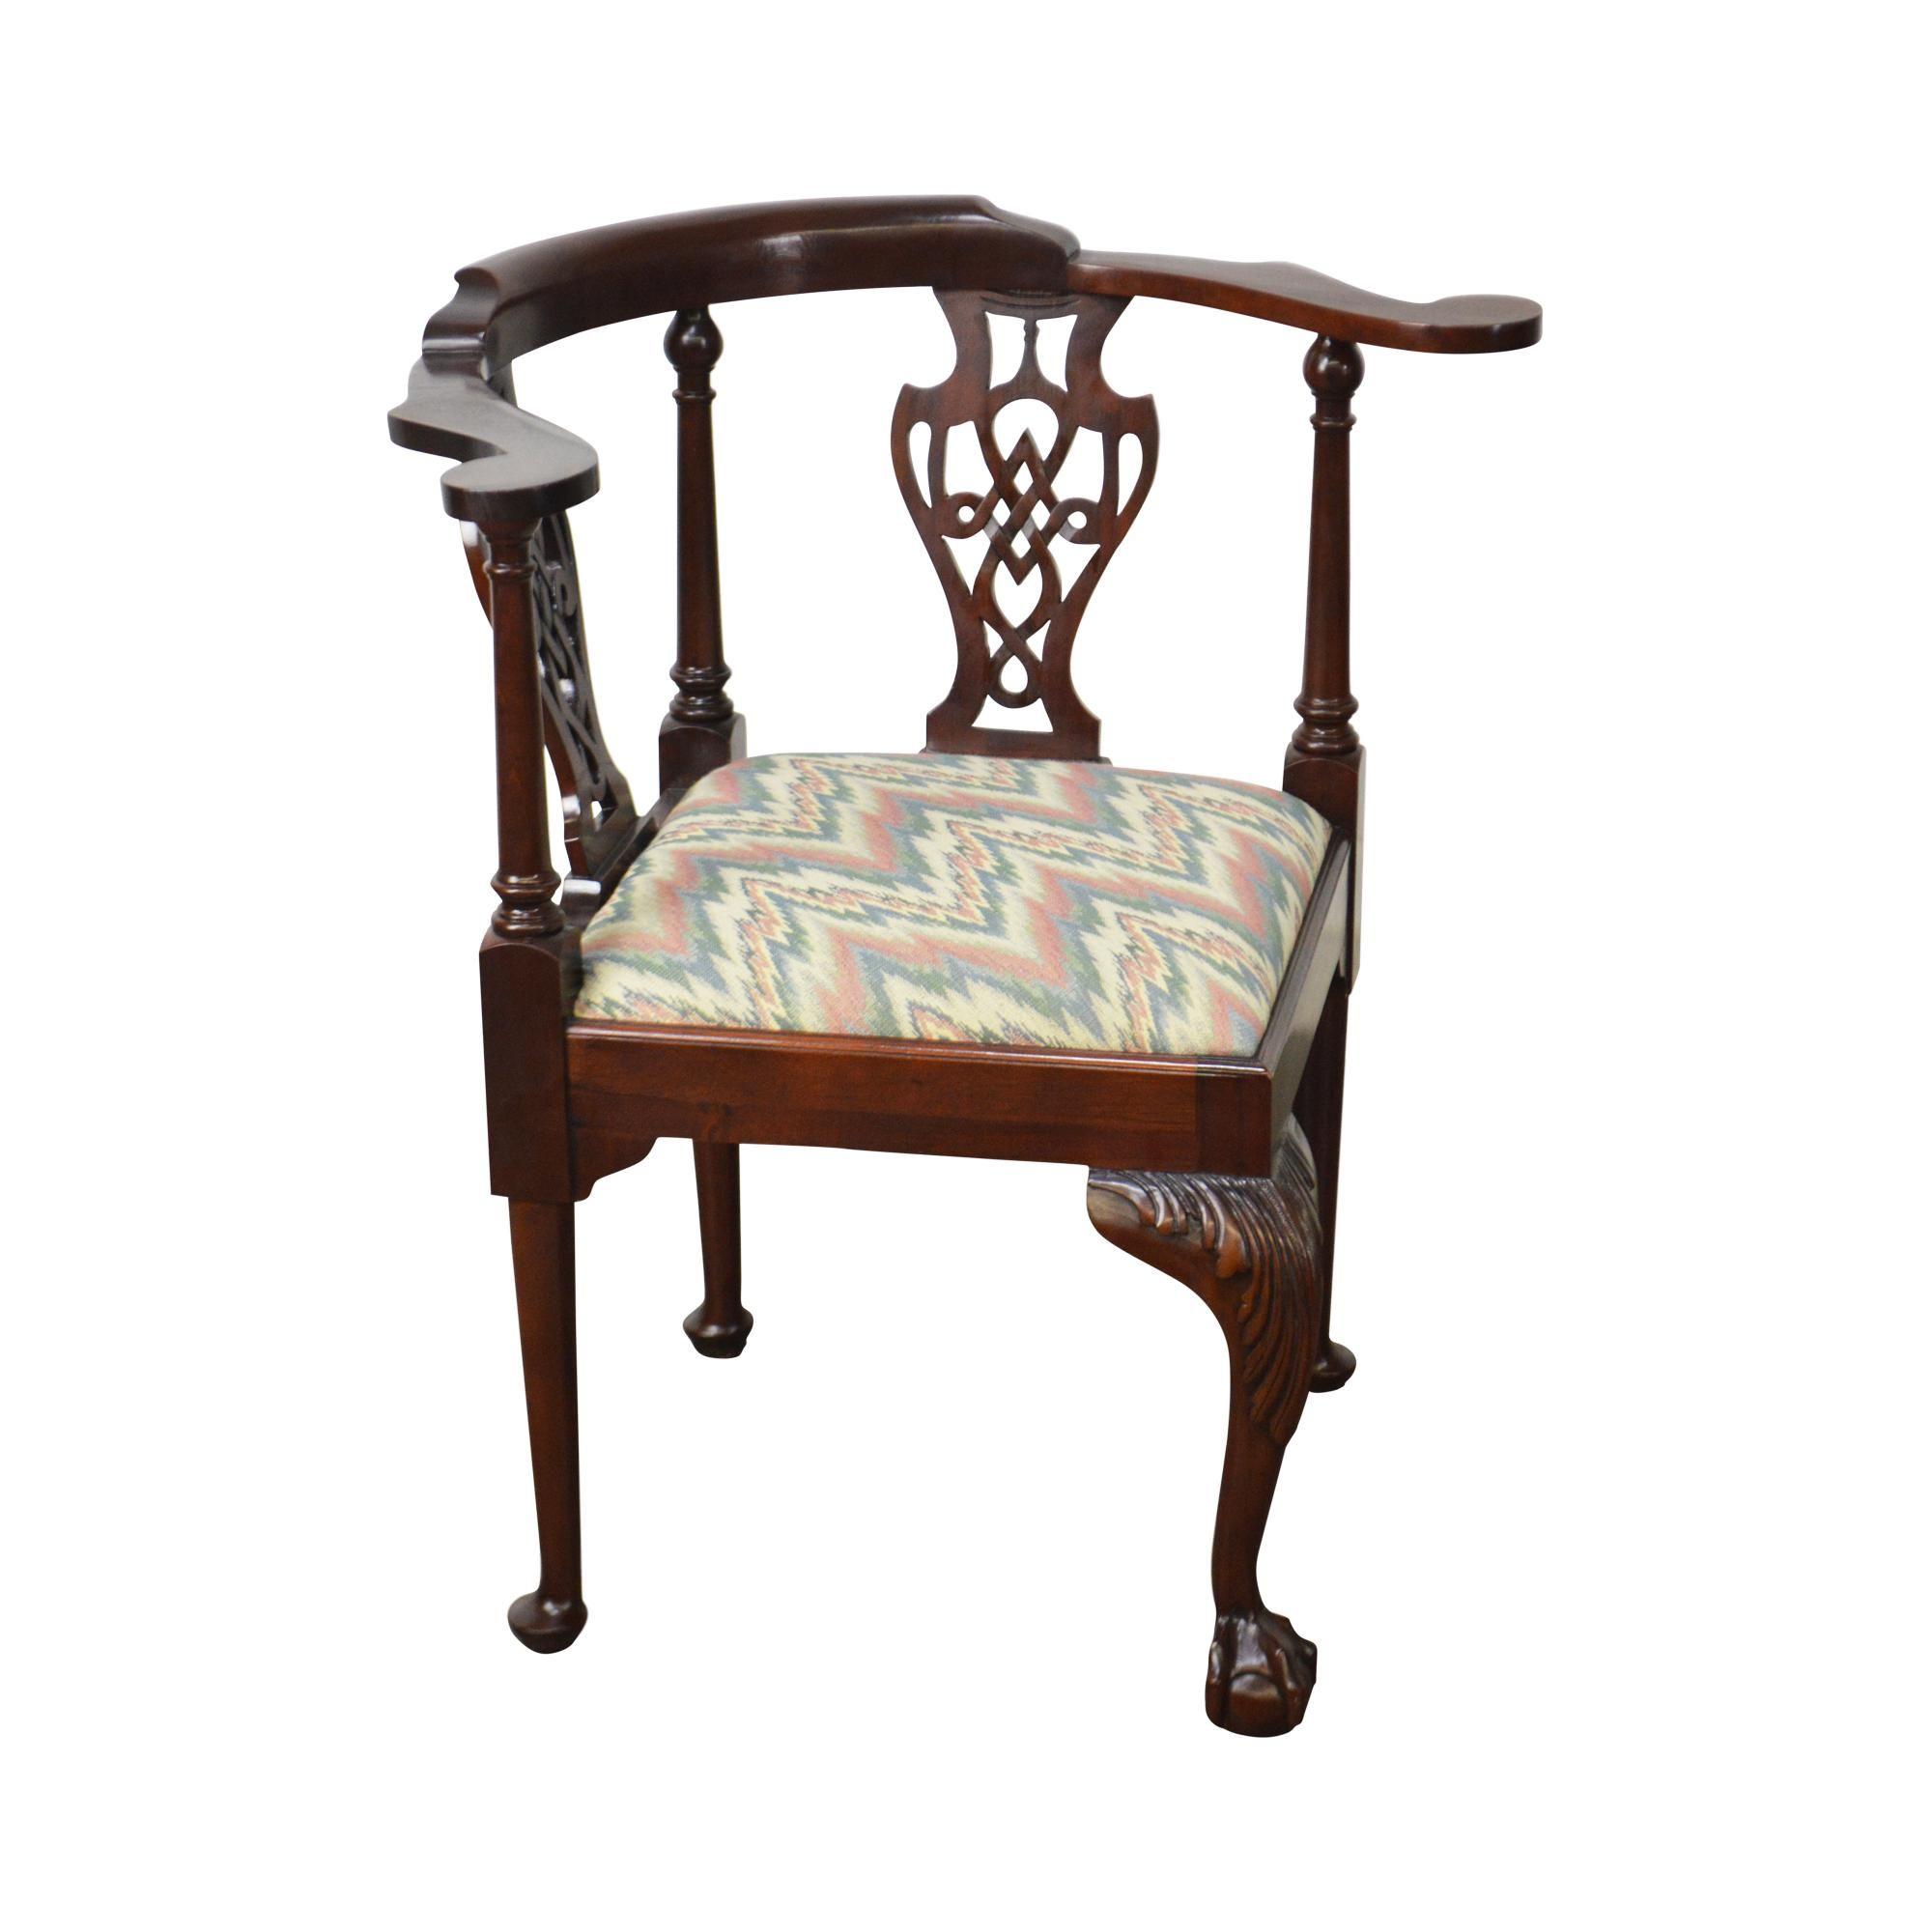 Enjoyable Southwood Chippendale Style Mahogany Ball Claw Corner Machost Co Dining Chair Design Ideas Machostcouk